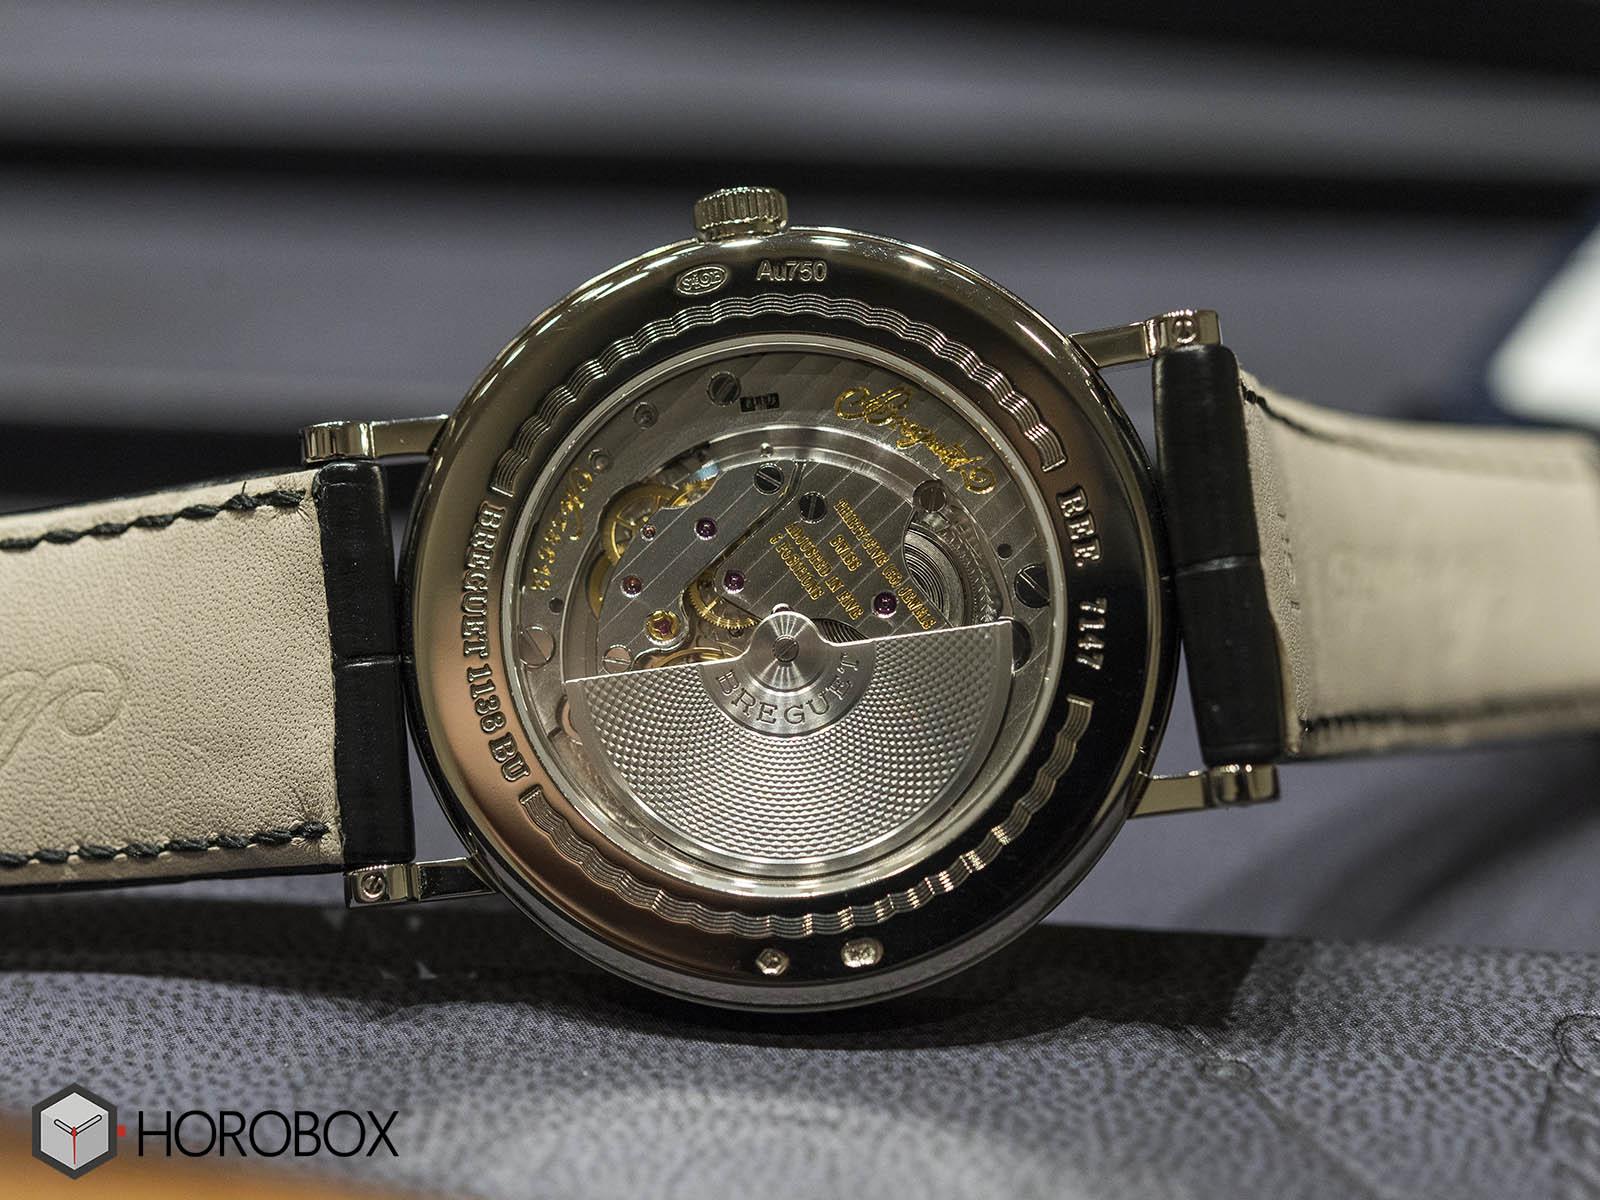 Breguet-Classique-7147-2.jpg